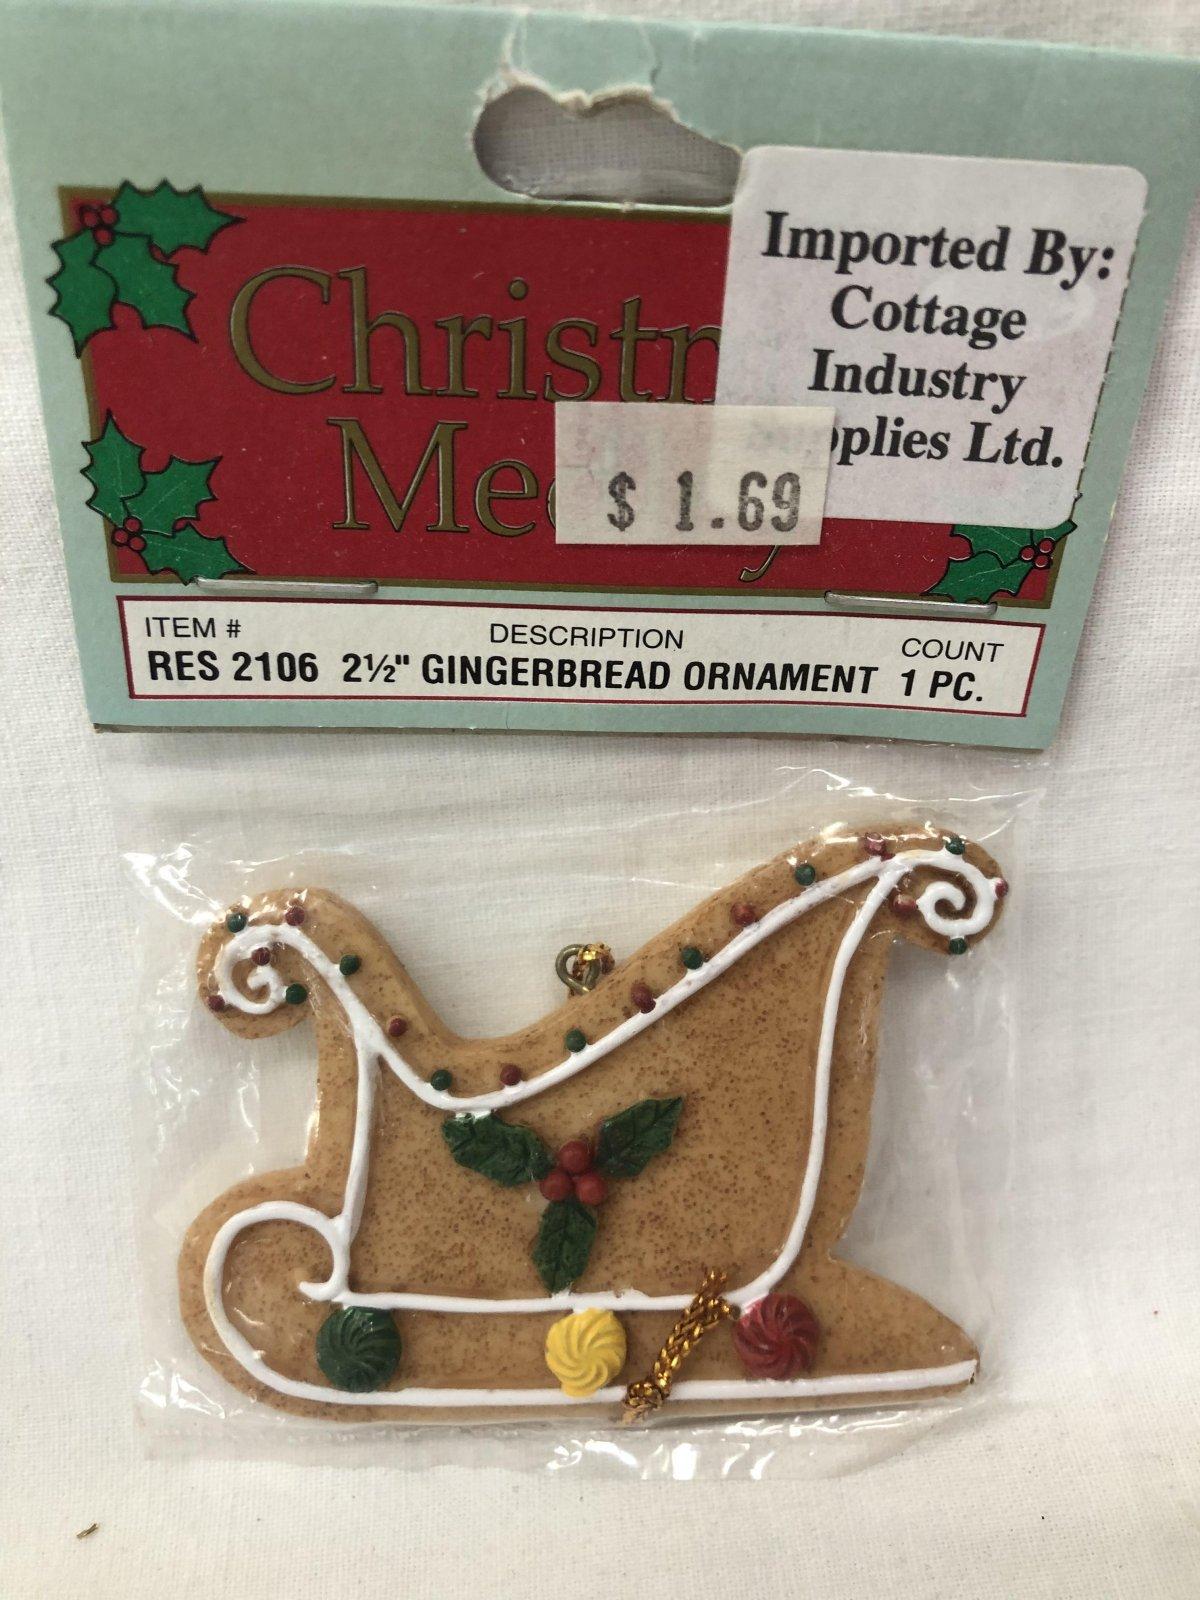 Christmas Medley Sleigh Gingerbread Ornament 717656130592